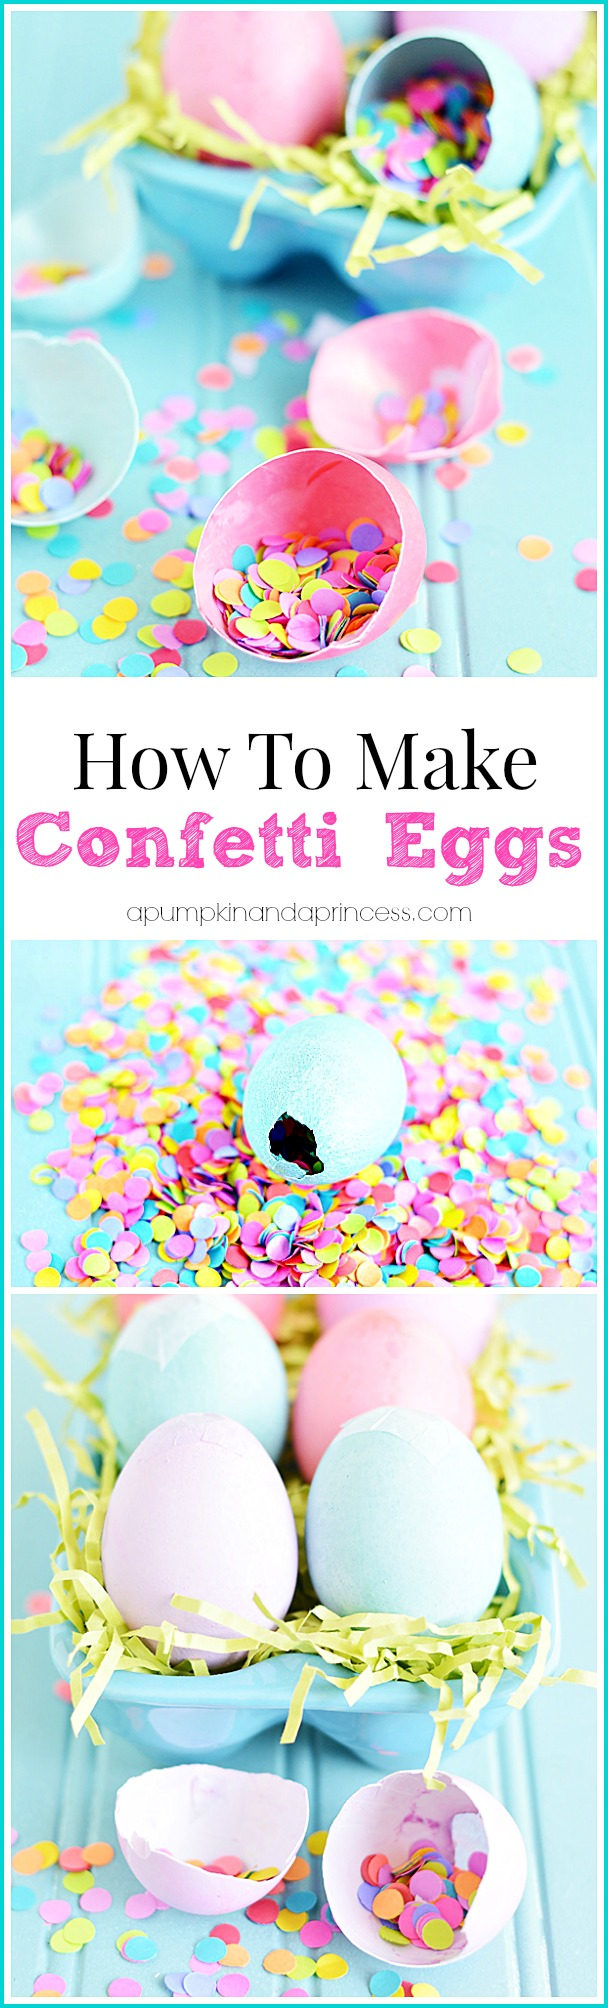 How To Make Confetti Eggs Tutorial